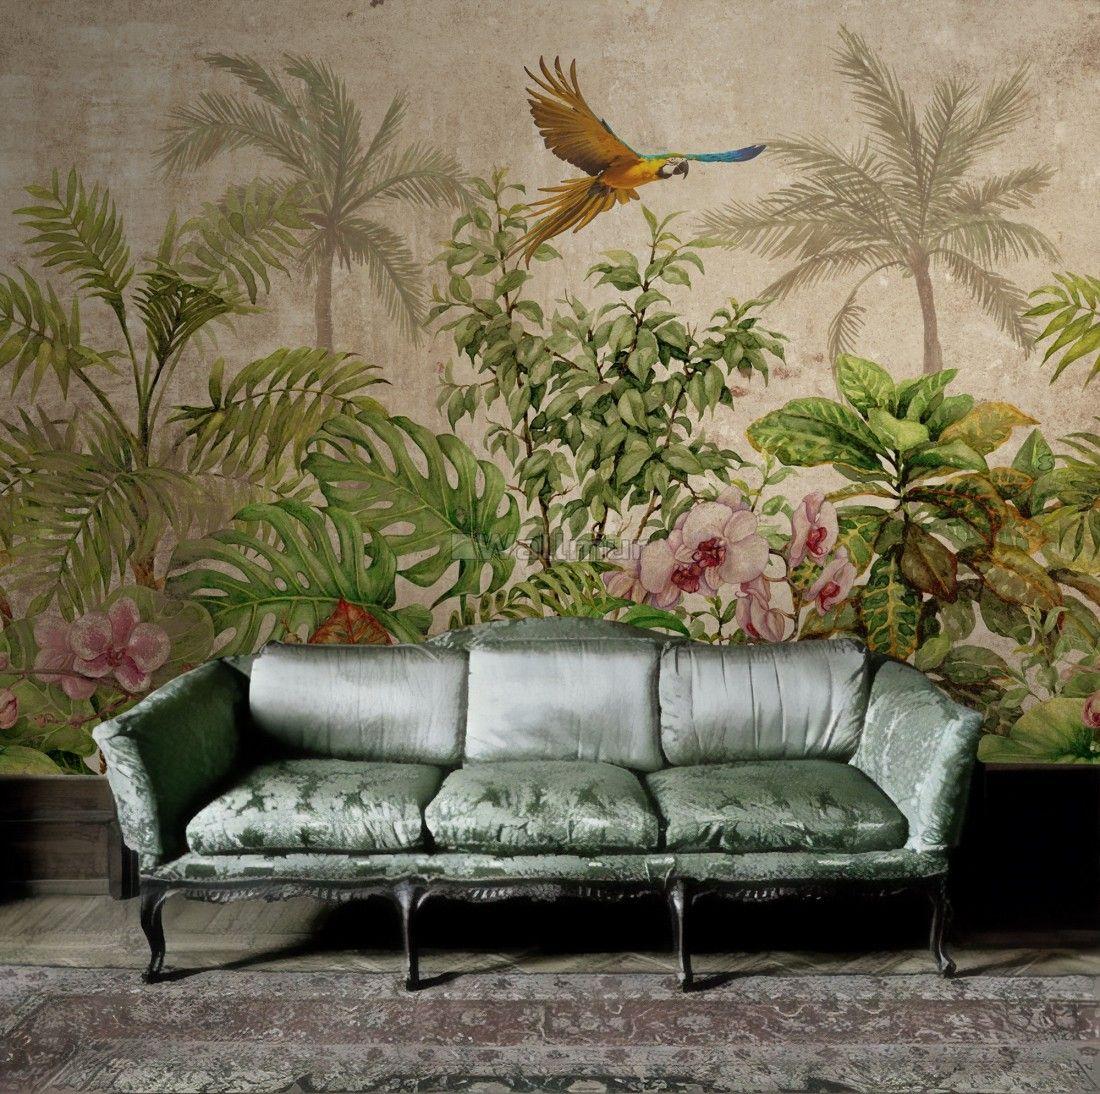 Tropical Vintage Forest Landscape Wallpaper Mural Wallmur Wall Art Wallpaper Mural Wallpaper Forest Wall Mural